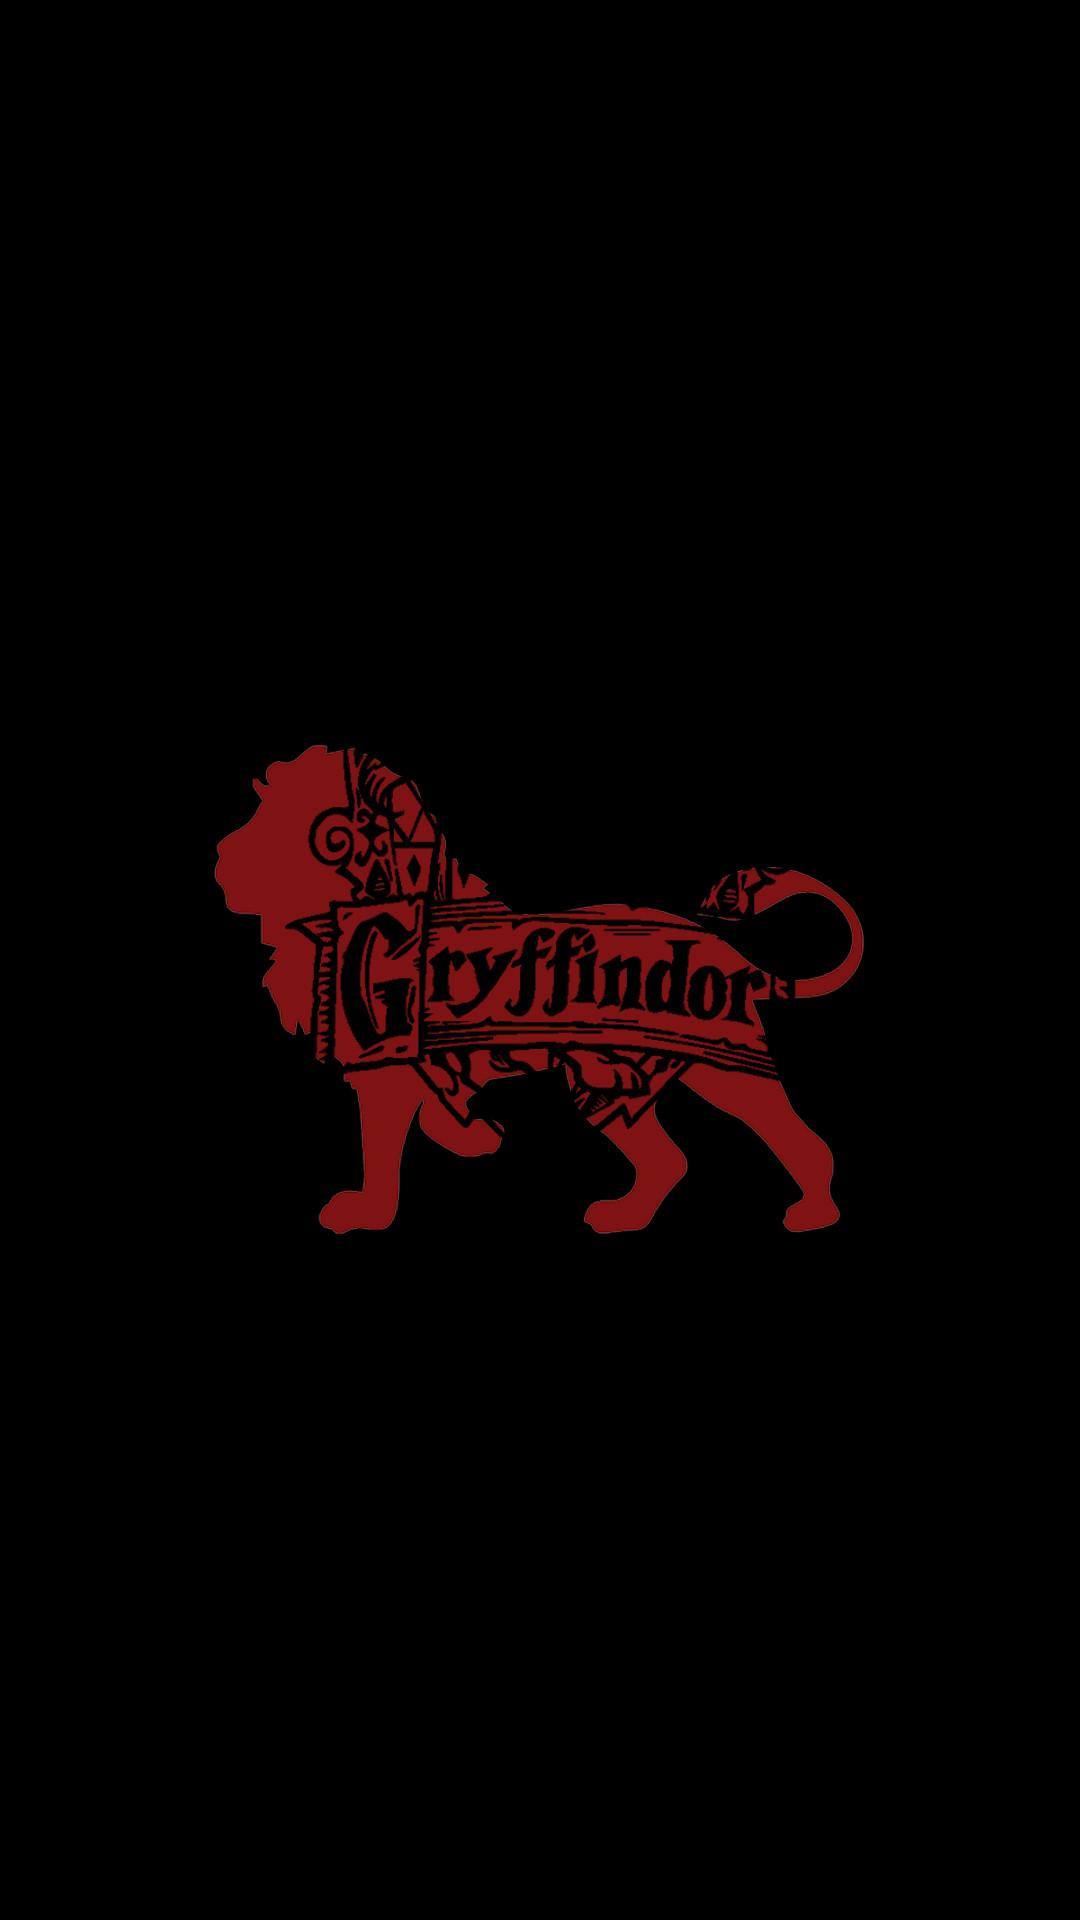 Res: 1080x1920, Gryffindor I am Ravenclaw but Gryiffindor is soo good